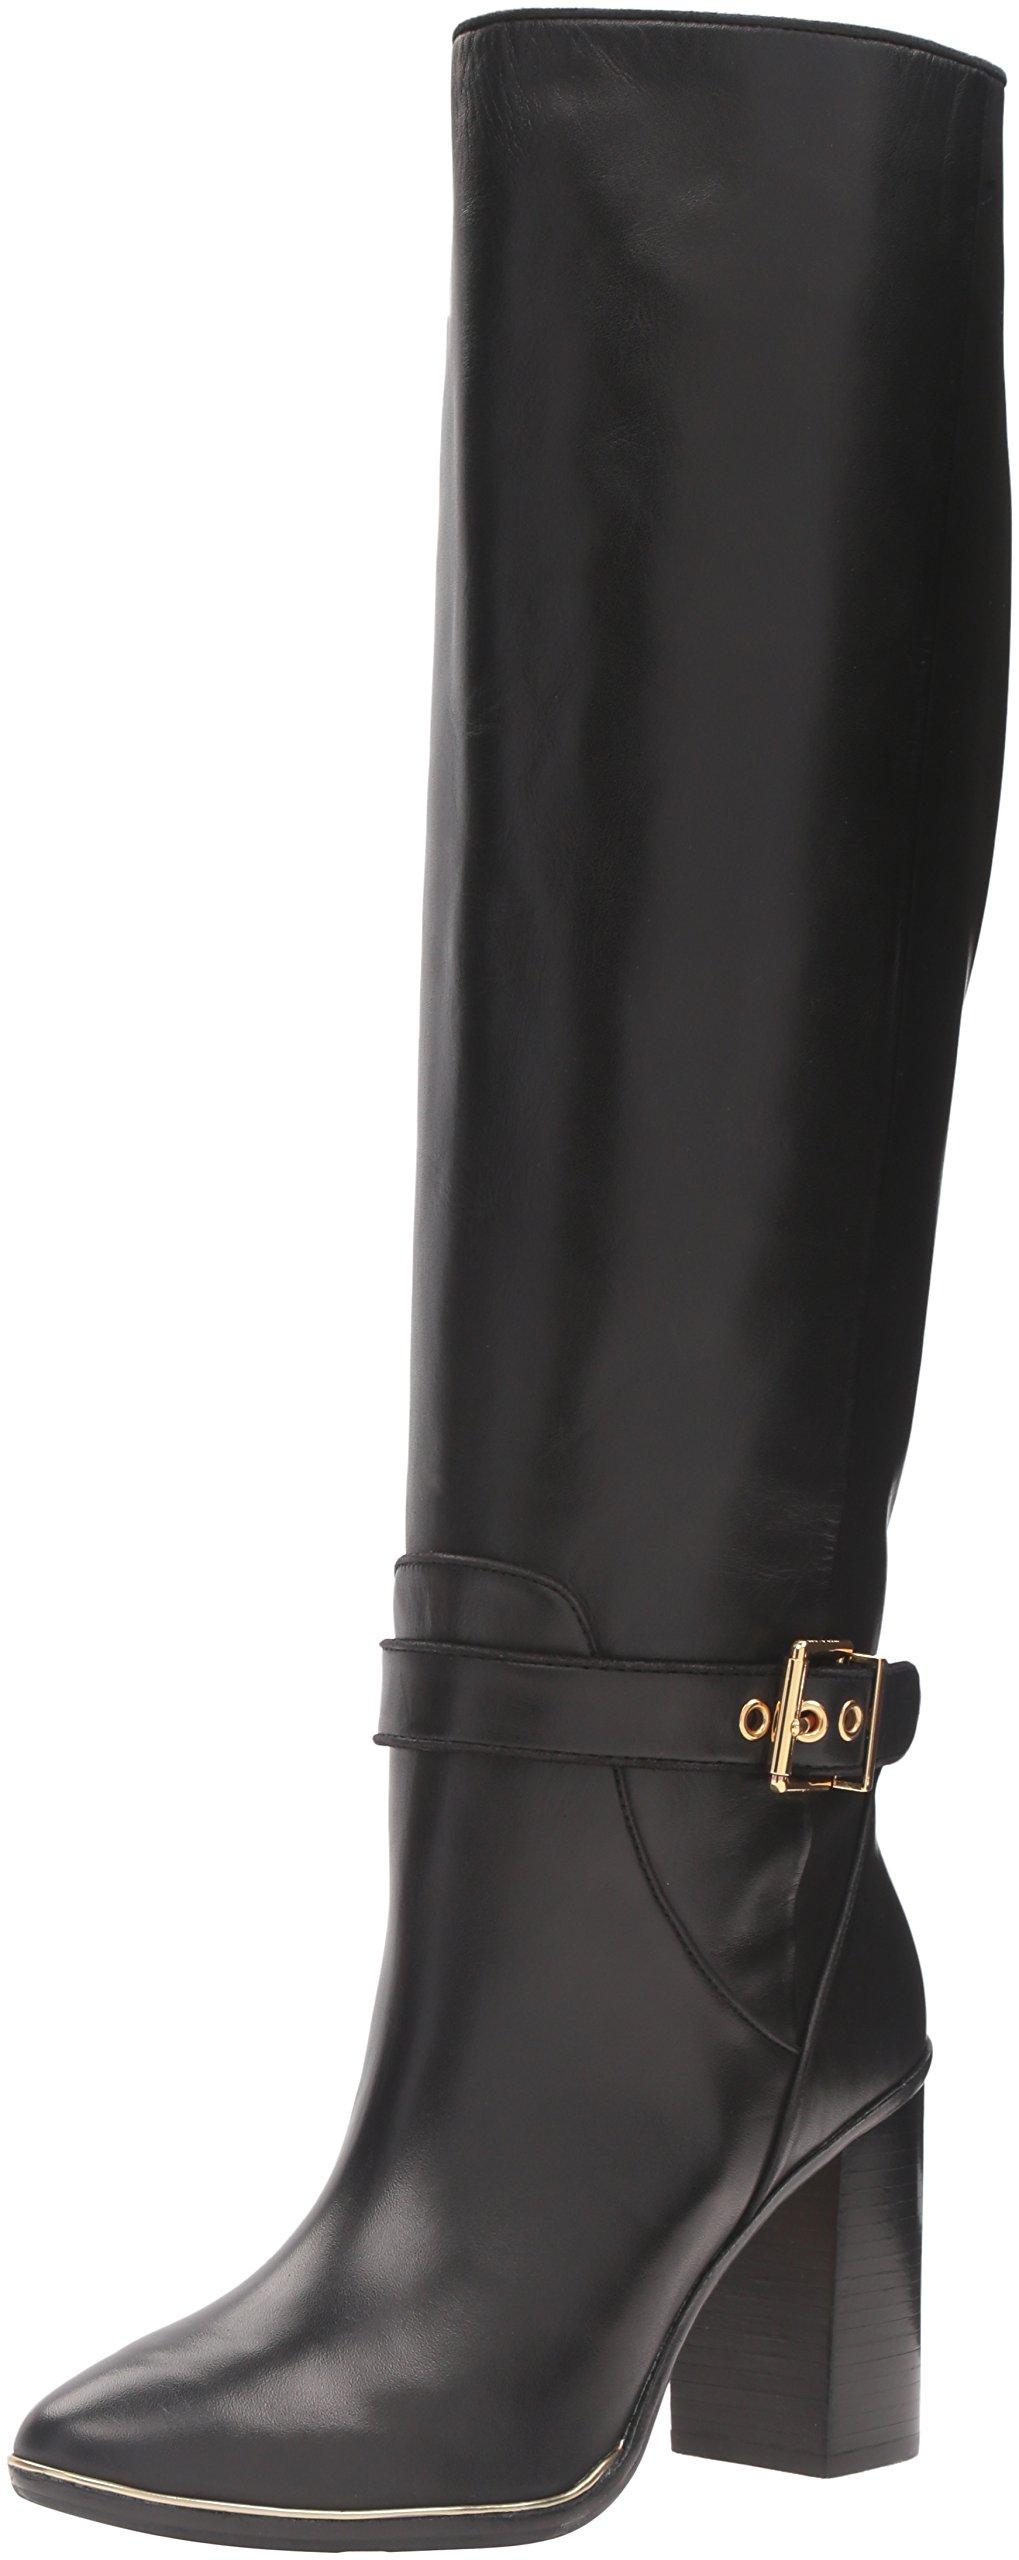 Ted Baker Women's Niida Winter Boot, Black, 7.5 M US